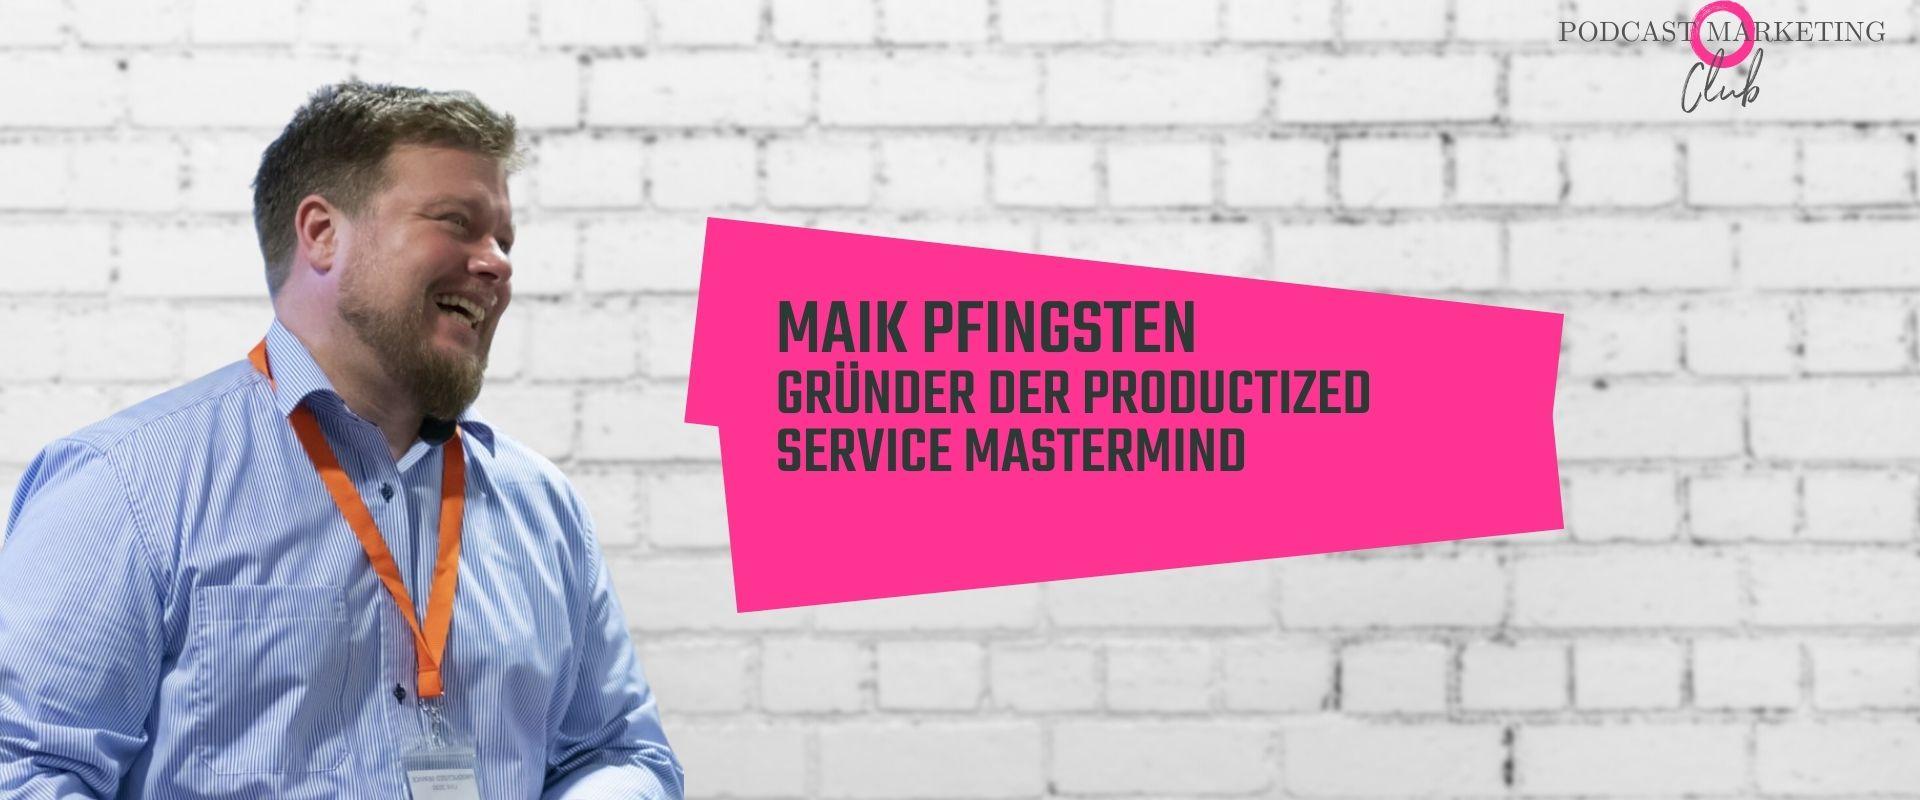 Maik Pfingsten Podcast verkaufen 104